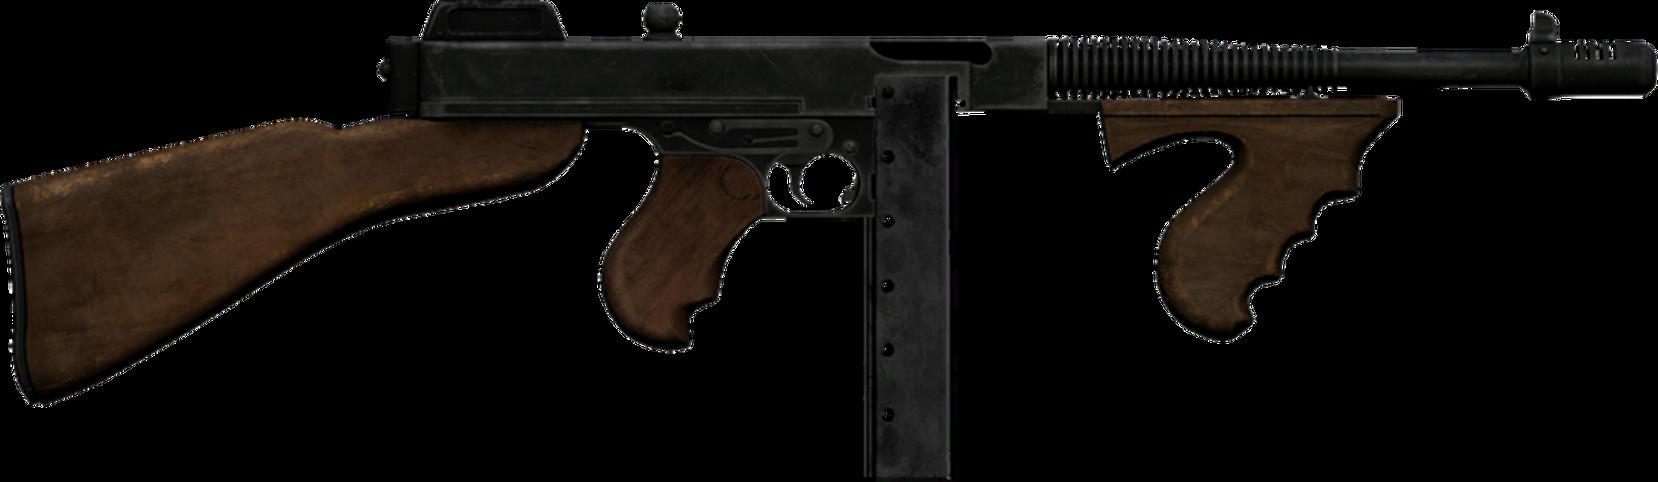 M1928 Thompson 30mag Arma 3